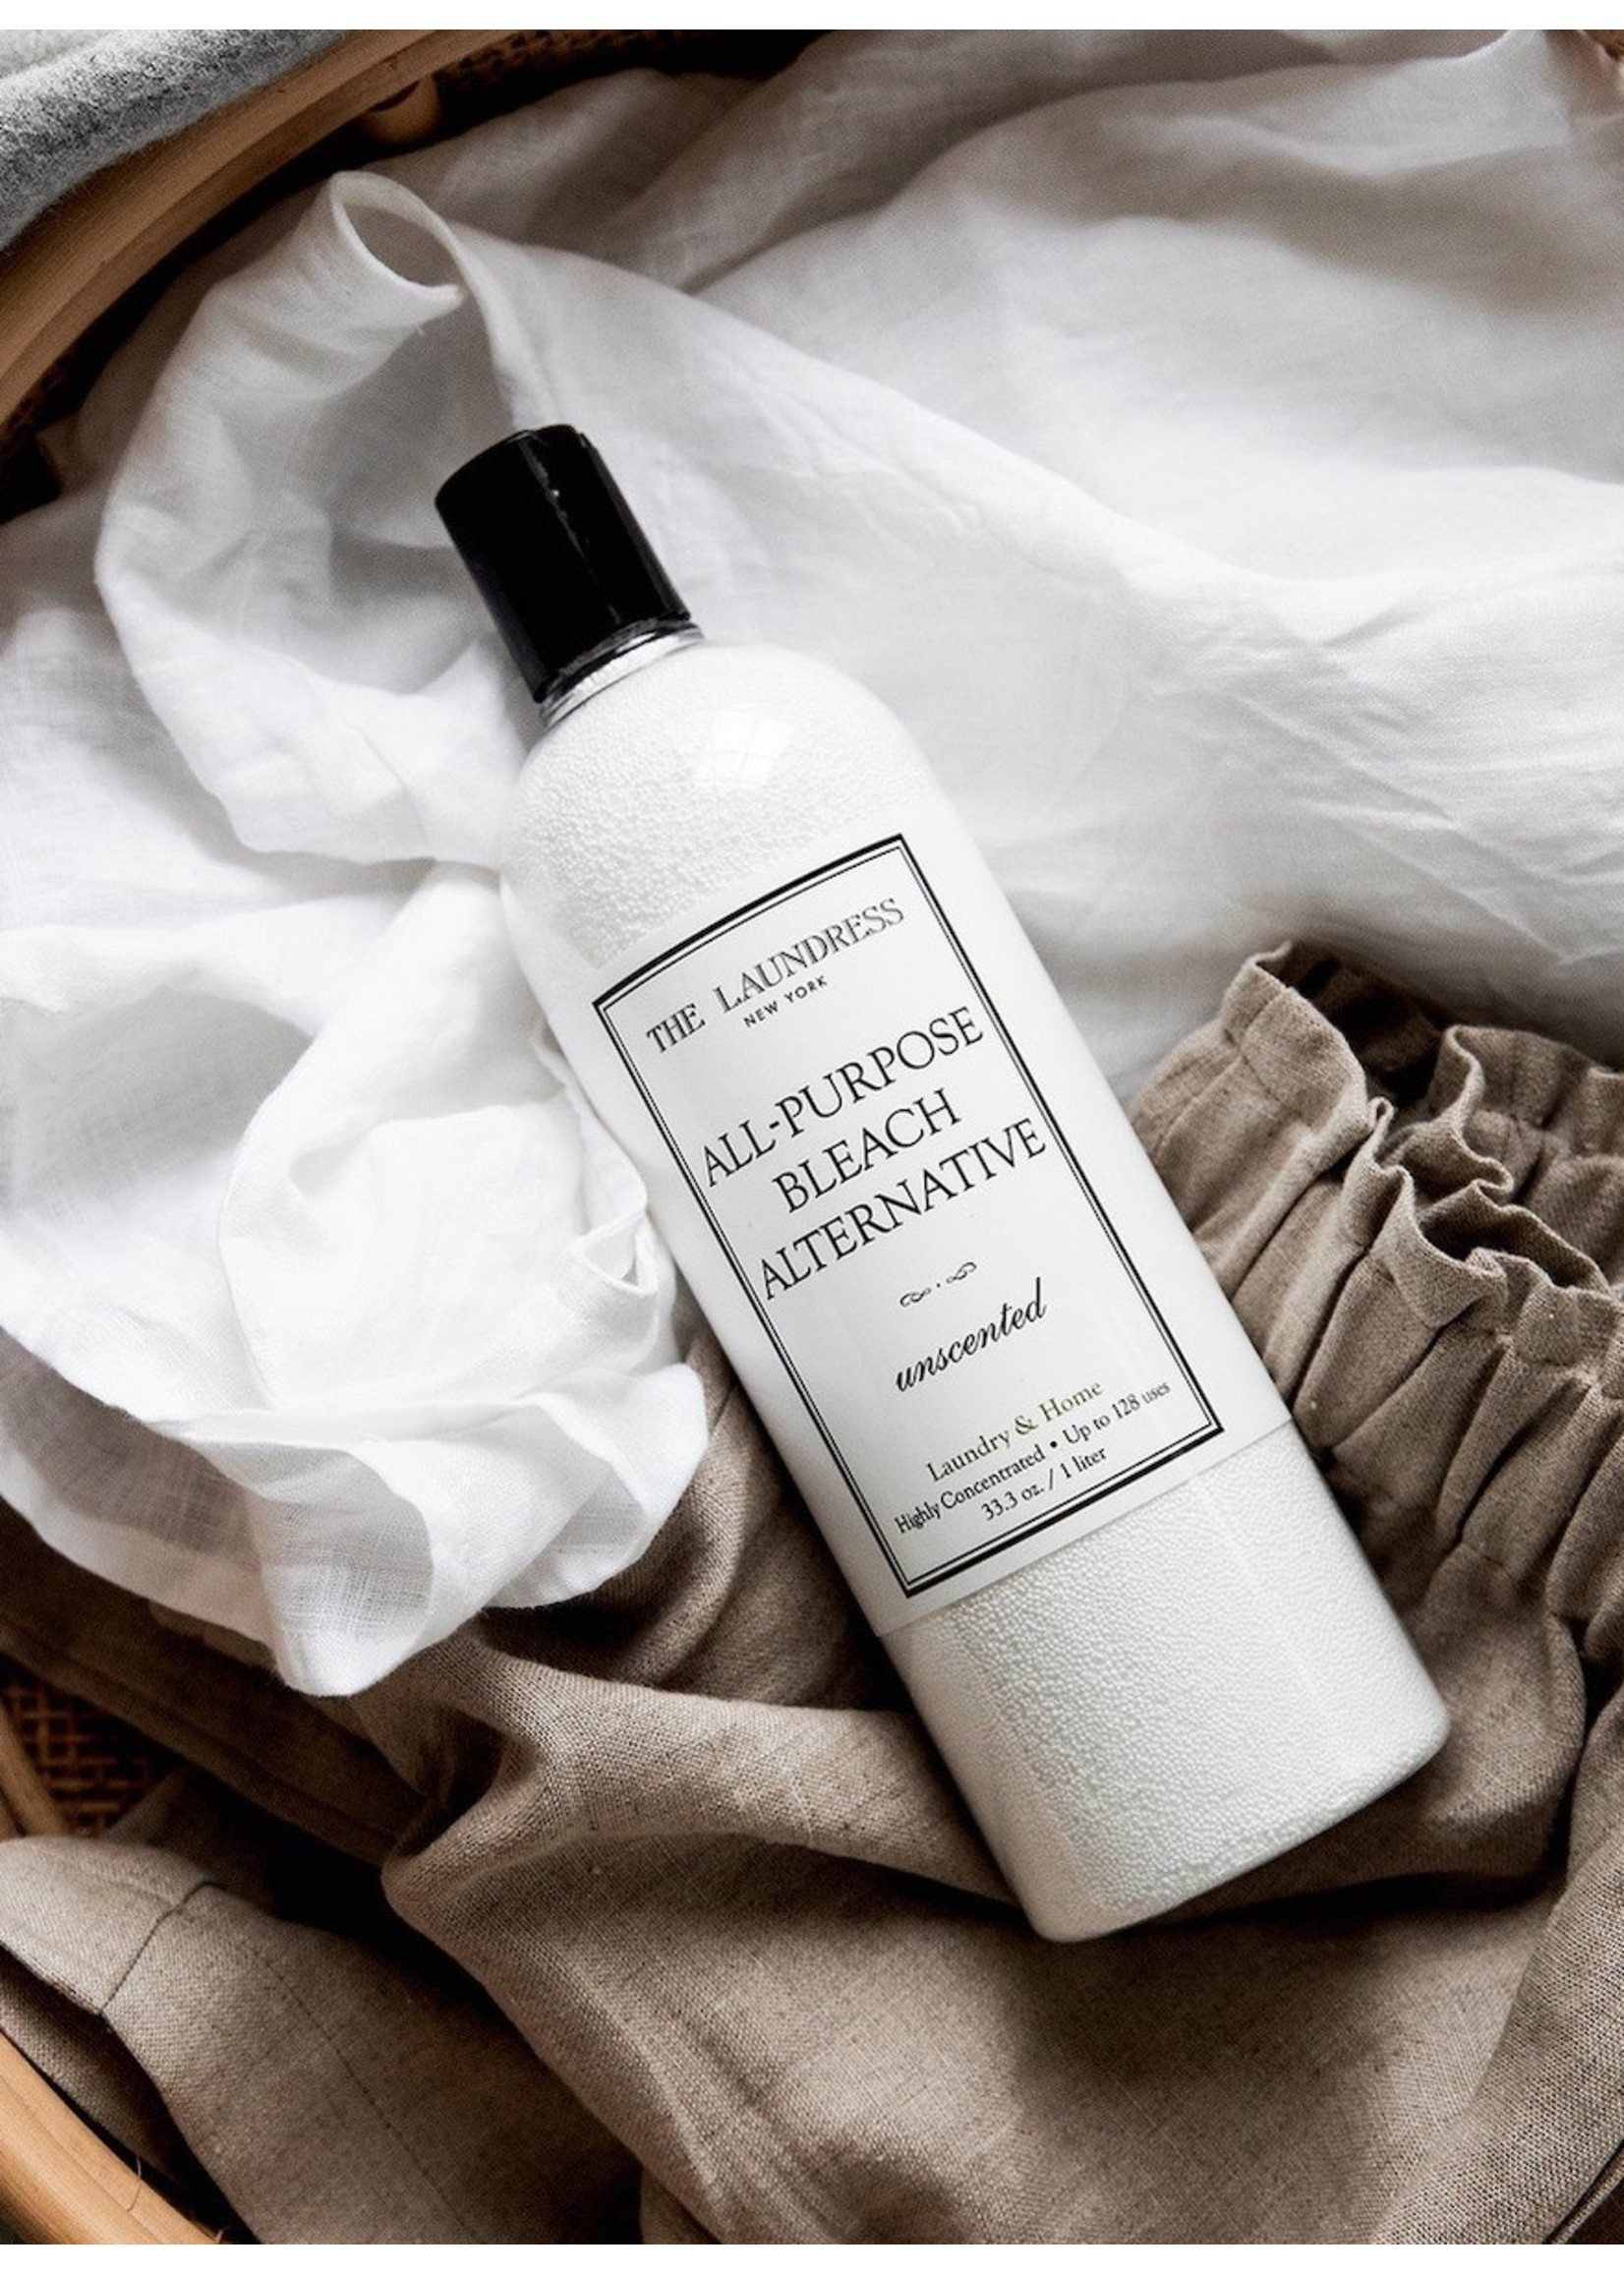 The Laundress New York All-Purpose Bleach Alternative